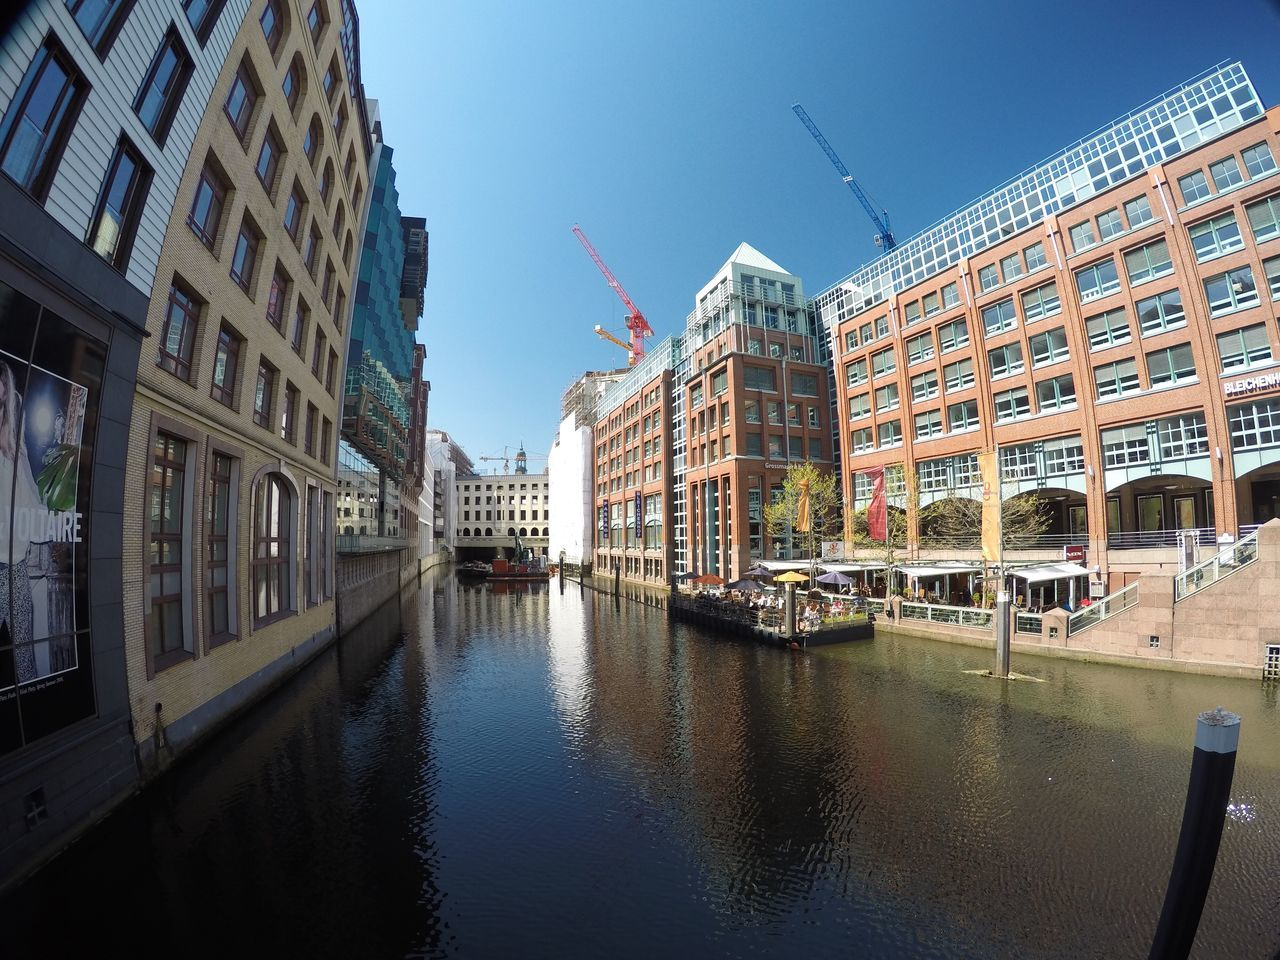 Hello World Taking Photos Sunny Day GERMANY🇩🇪DEUTSCHERLAND@ Hambourg Nice City Clean